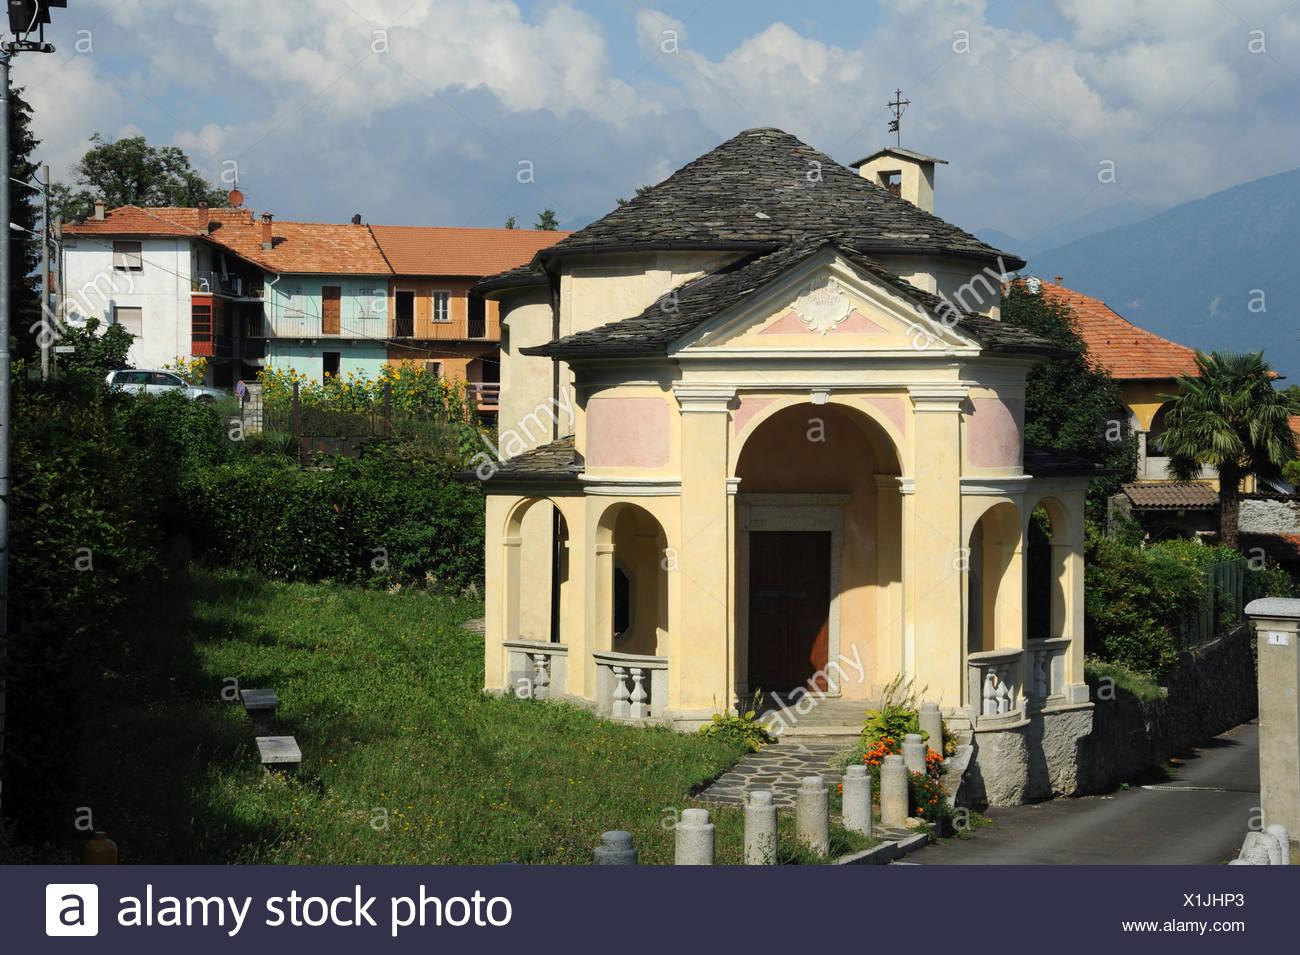 Italy, Piemont, Orta, Vacciago, church, Sant Anna, - Stock Image